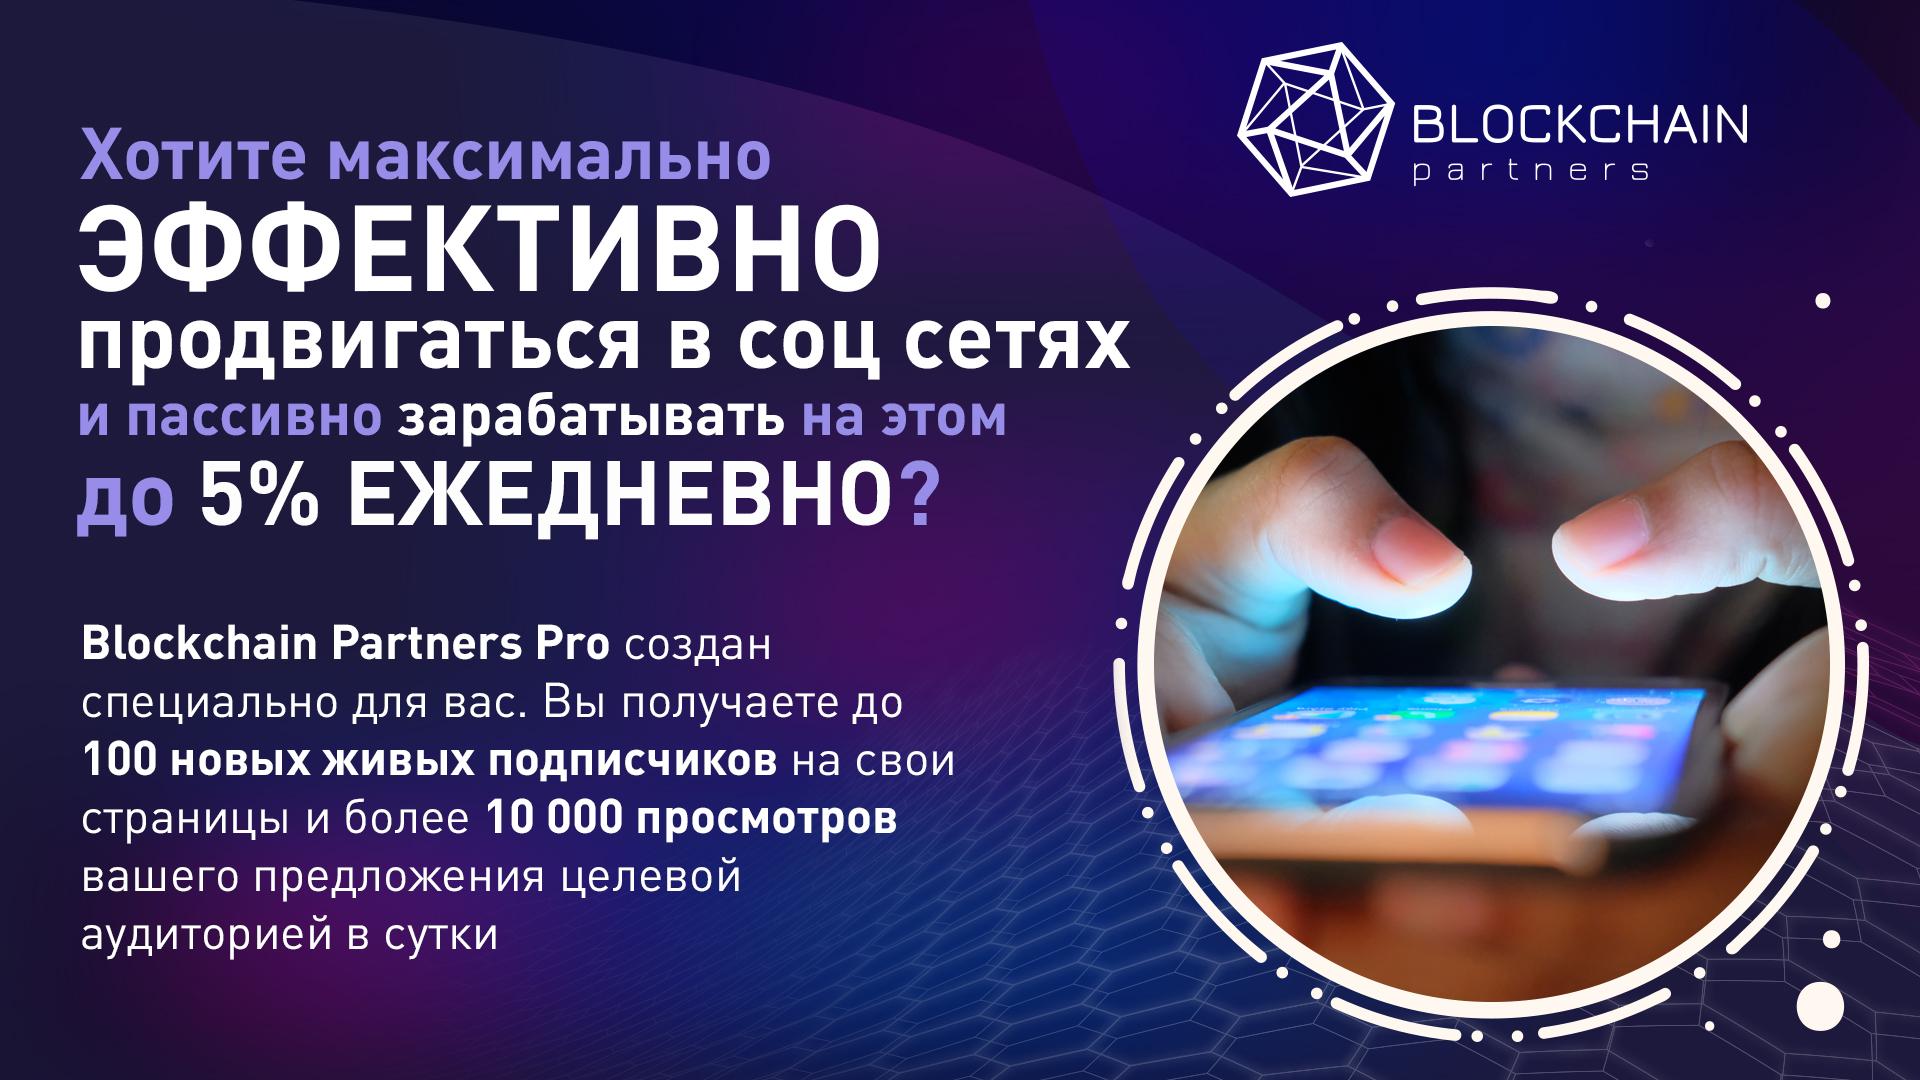 Blockchain Partners Pro